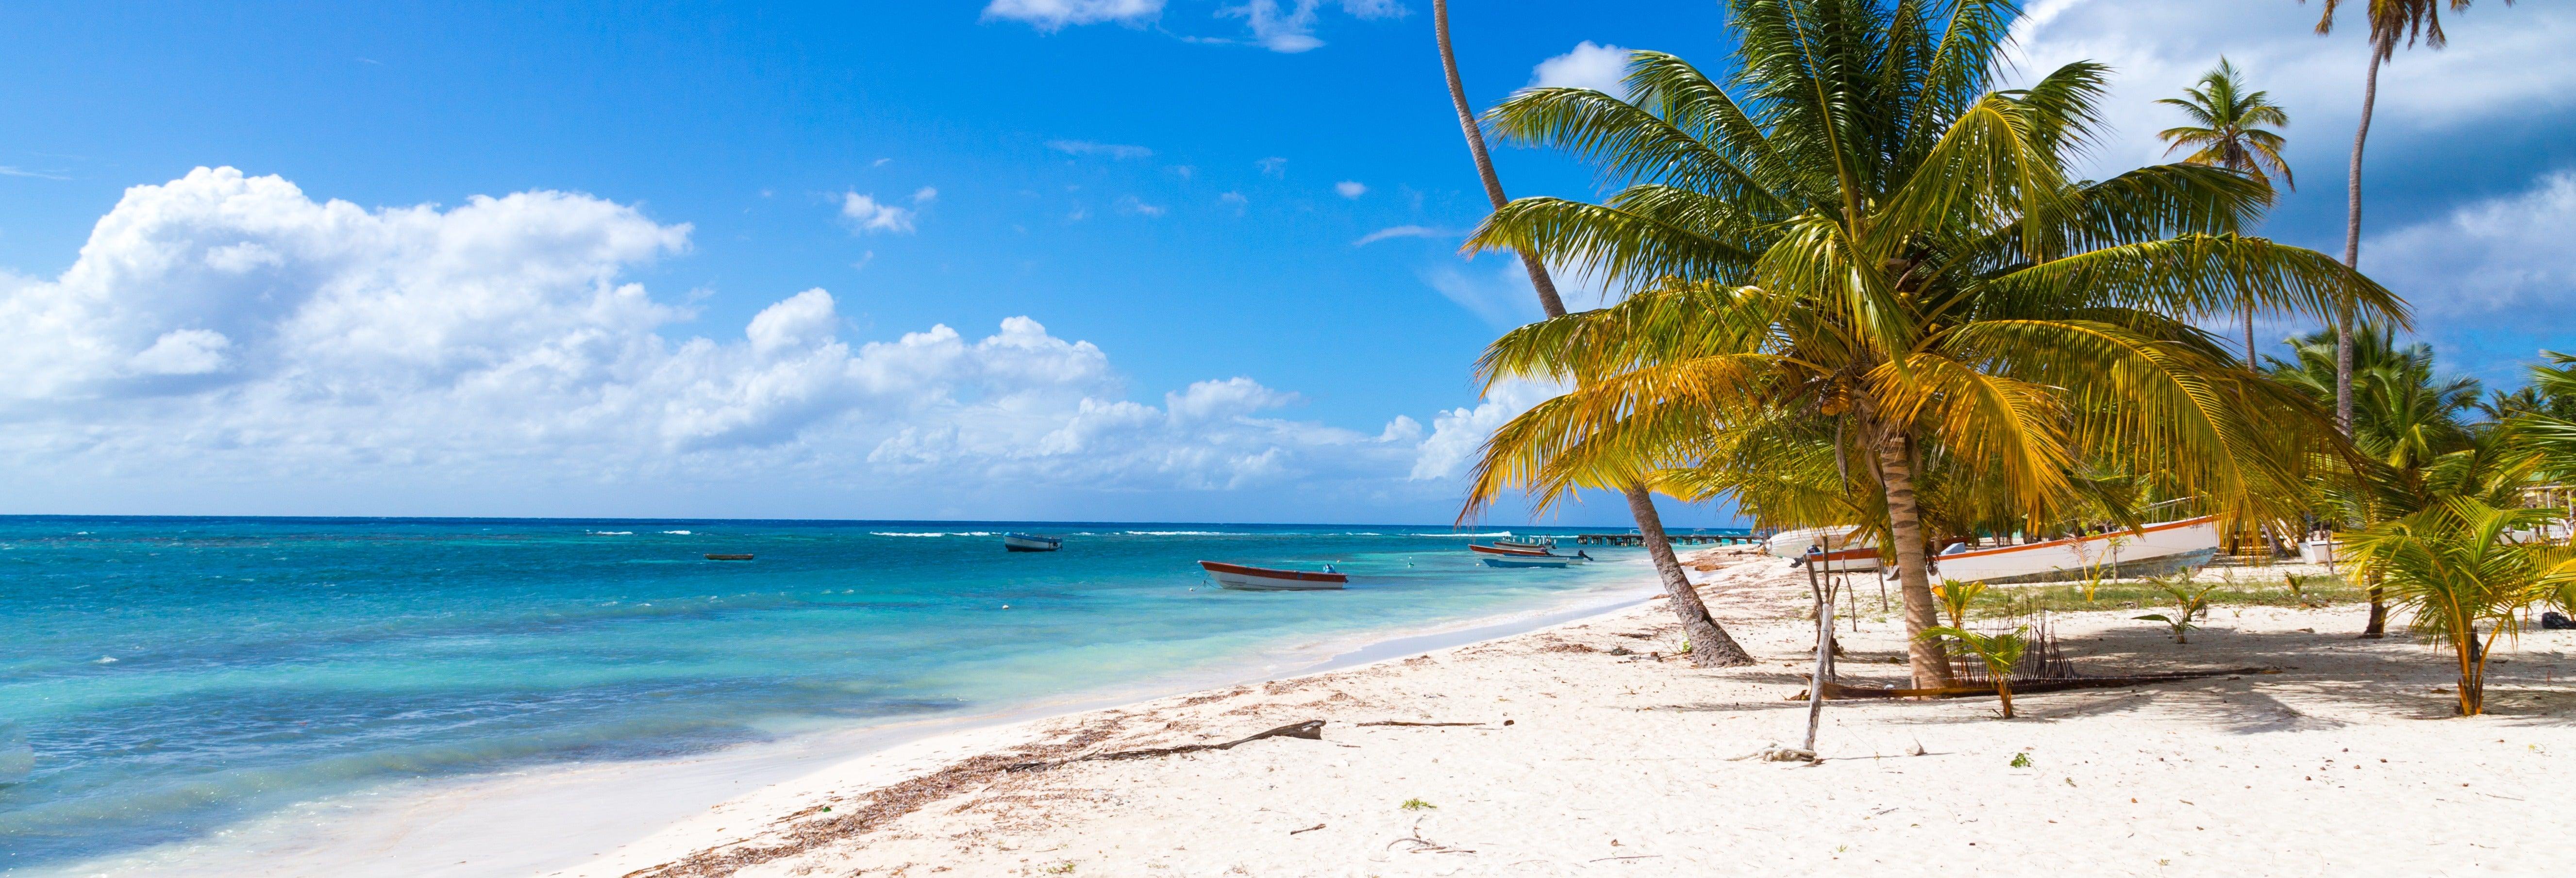 Tour pelas praias da ilha Saona